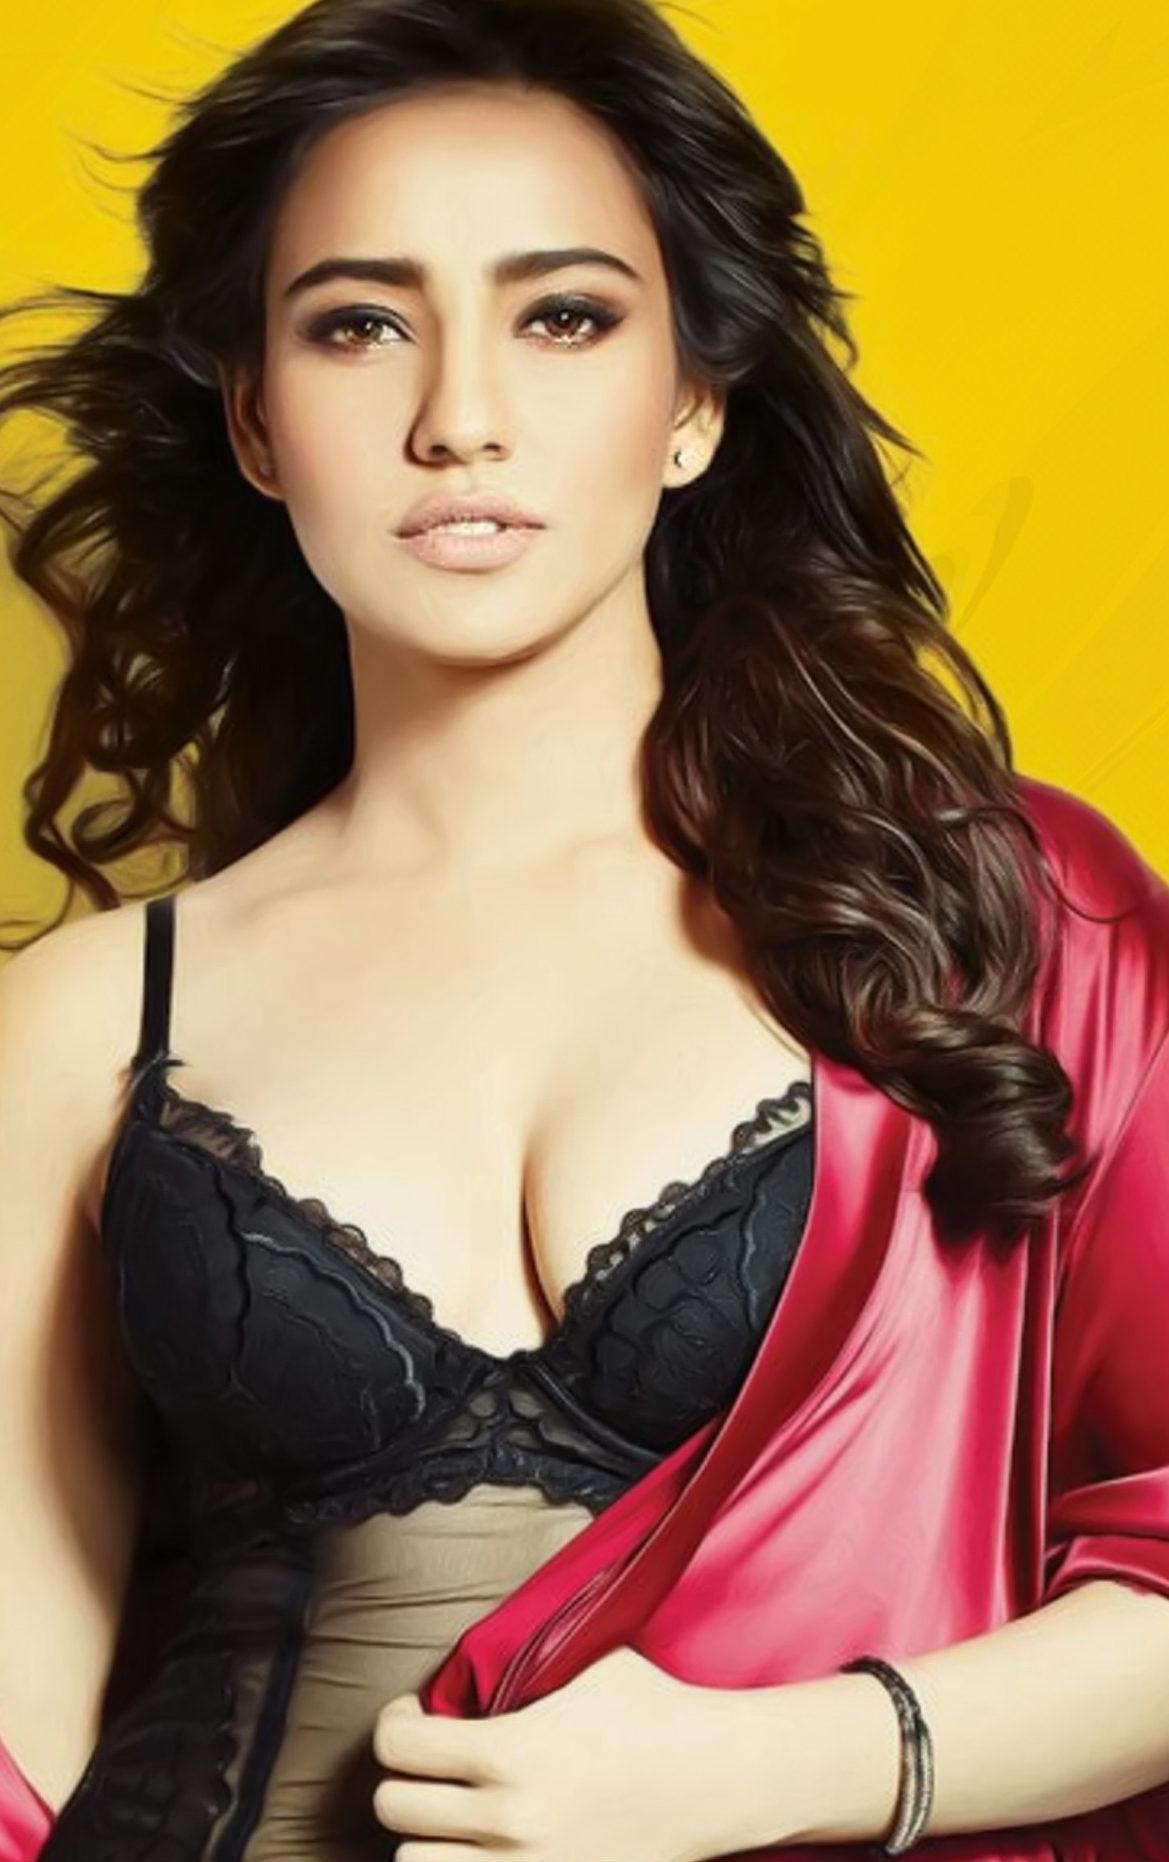 Neha-Sharma-Boobs-Cleavage-pics-e1501864066825 Neha Sharma 11+ Unseen Bikini Swimsuit Photographs Age & Wiki